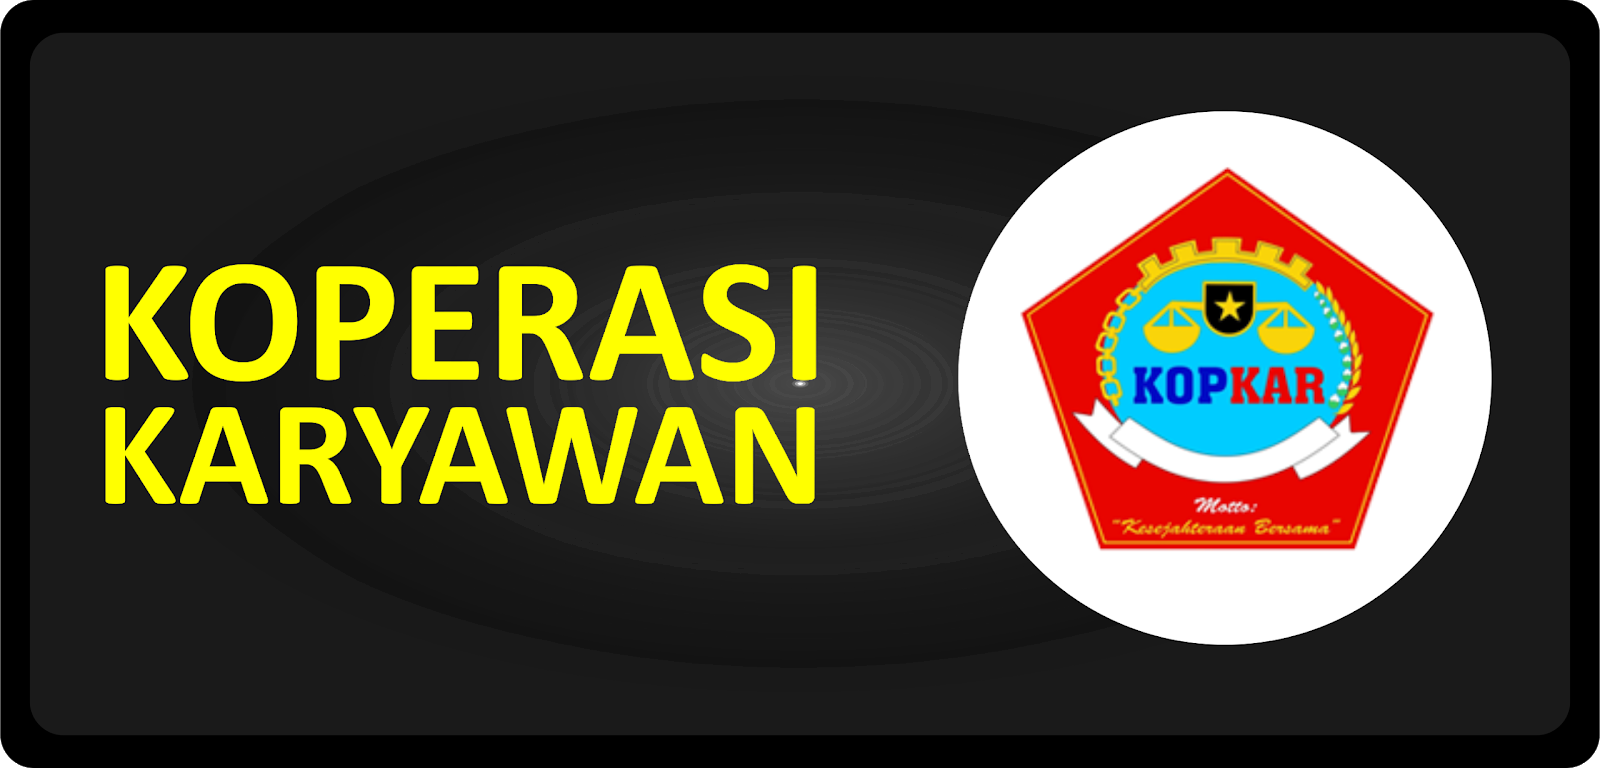 Koperasi Alfamart PT. Sumber Alfaria Trijaya, Tbk - Pinjaman Dana Tunia dan Kredit Barang